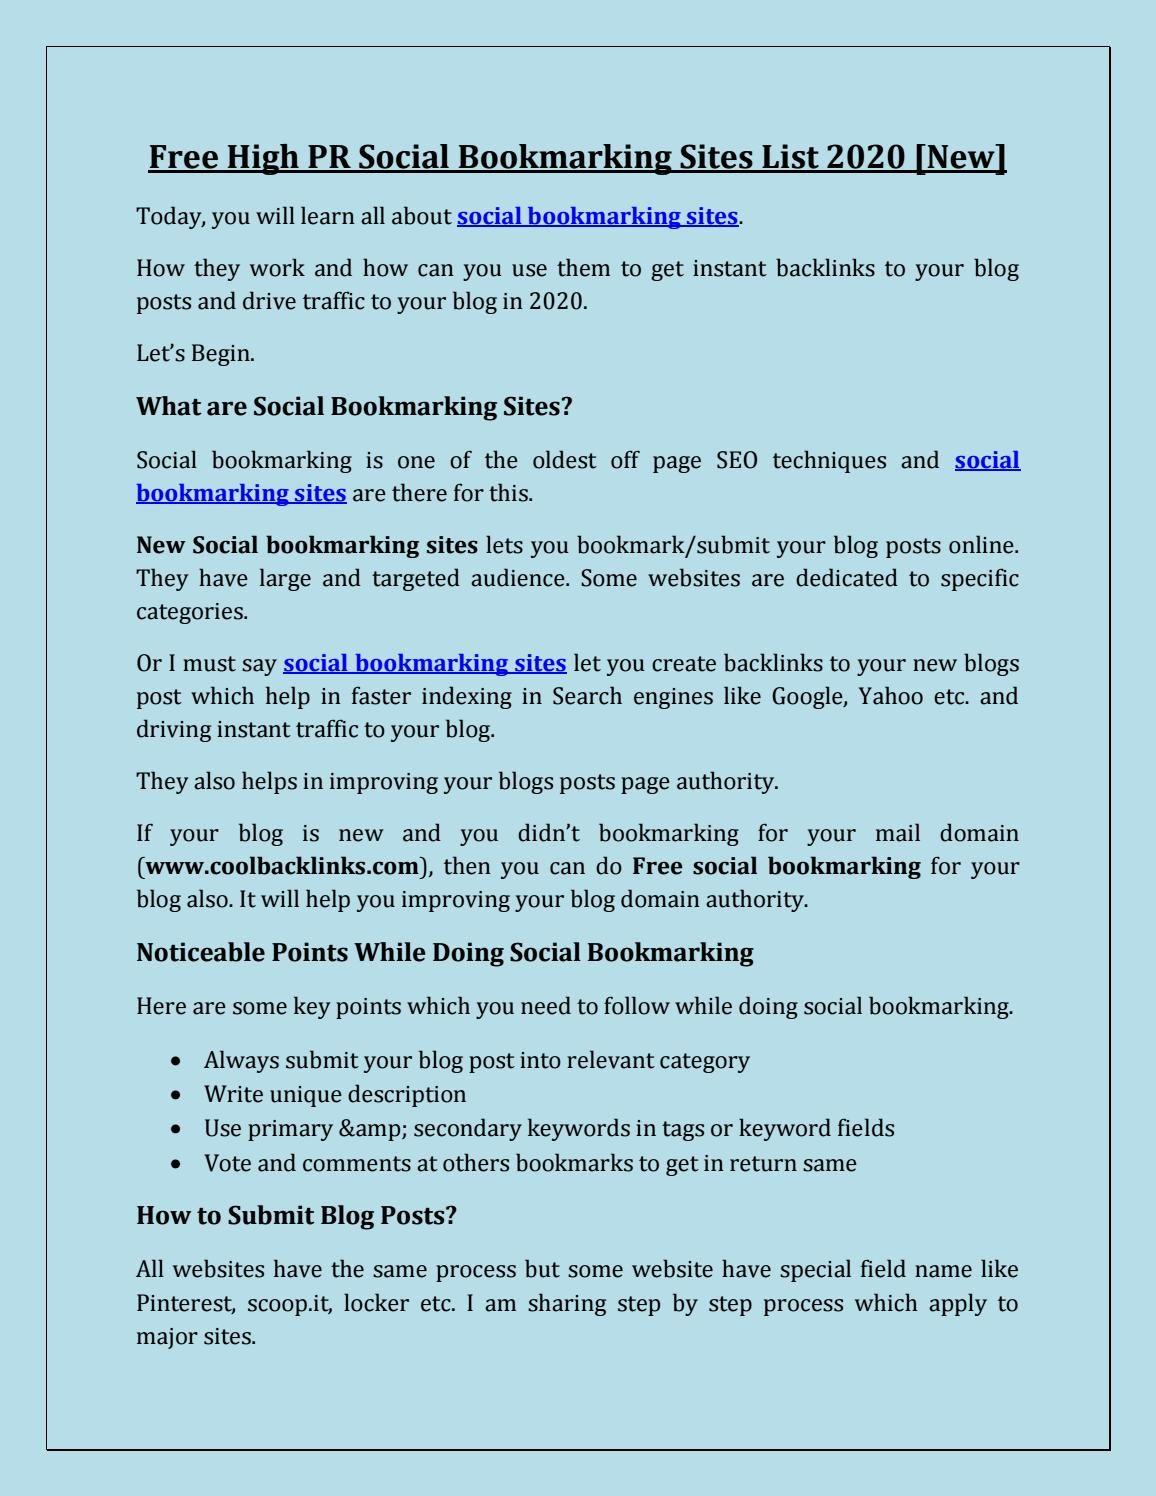 Free High Pr Social Bookmarking Sites List 2020 New Social Bookmarking Bookmarking Sites What Is Social